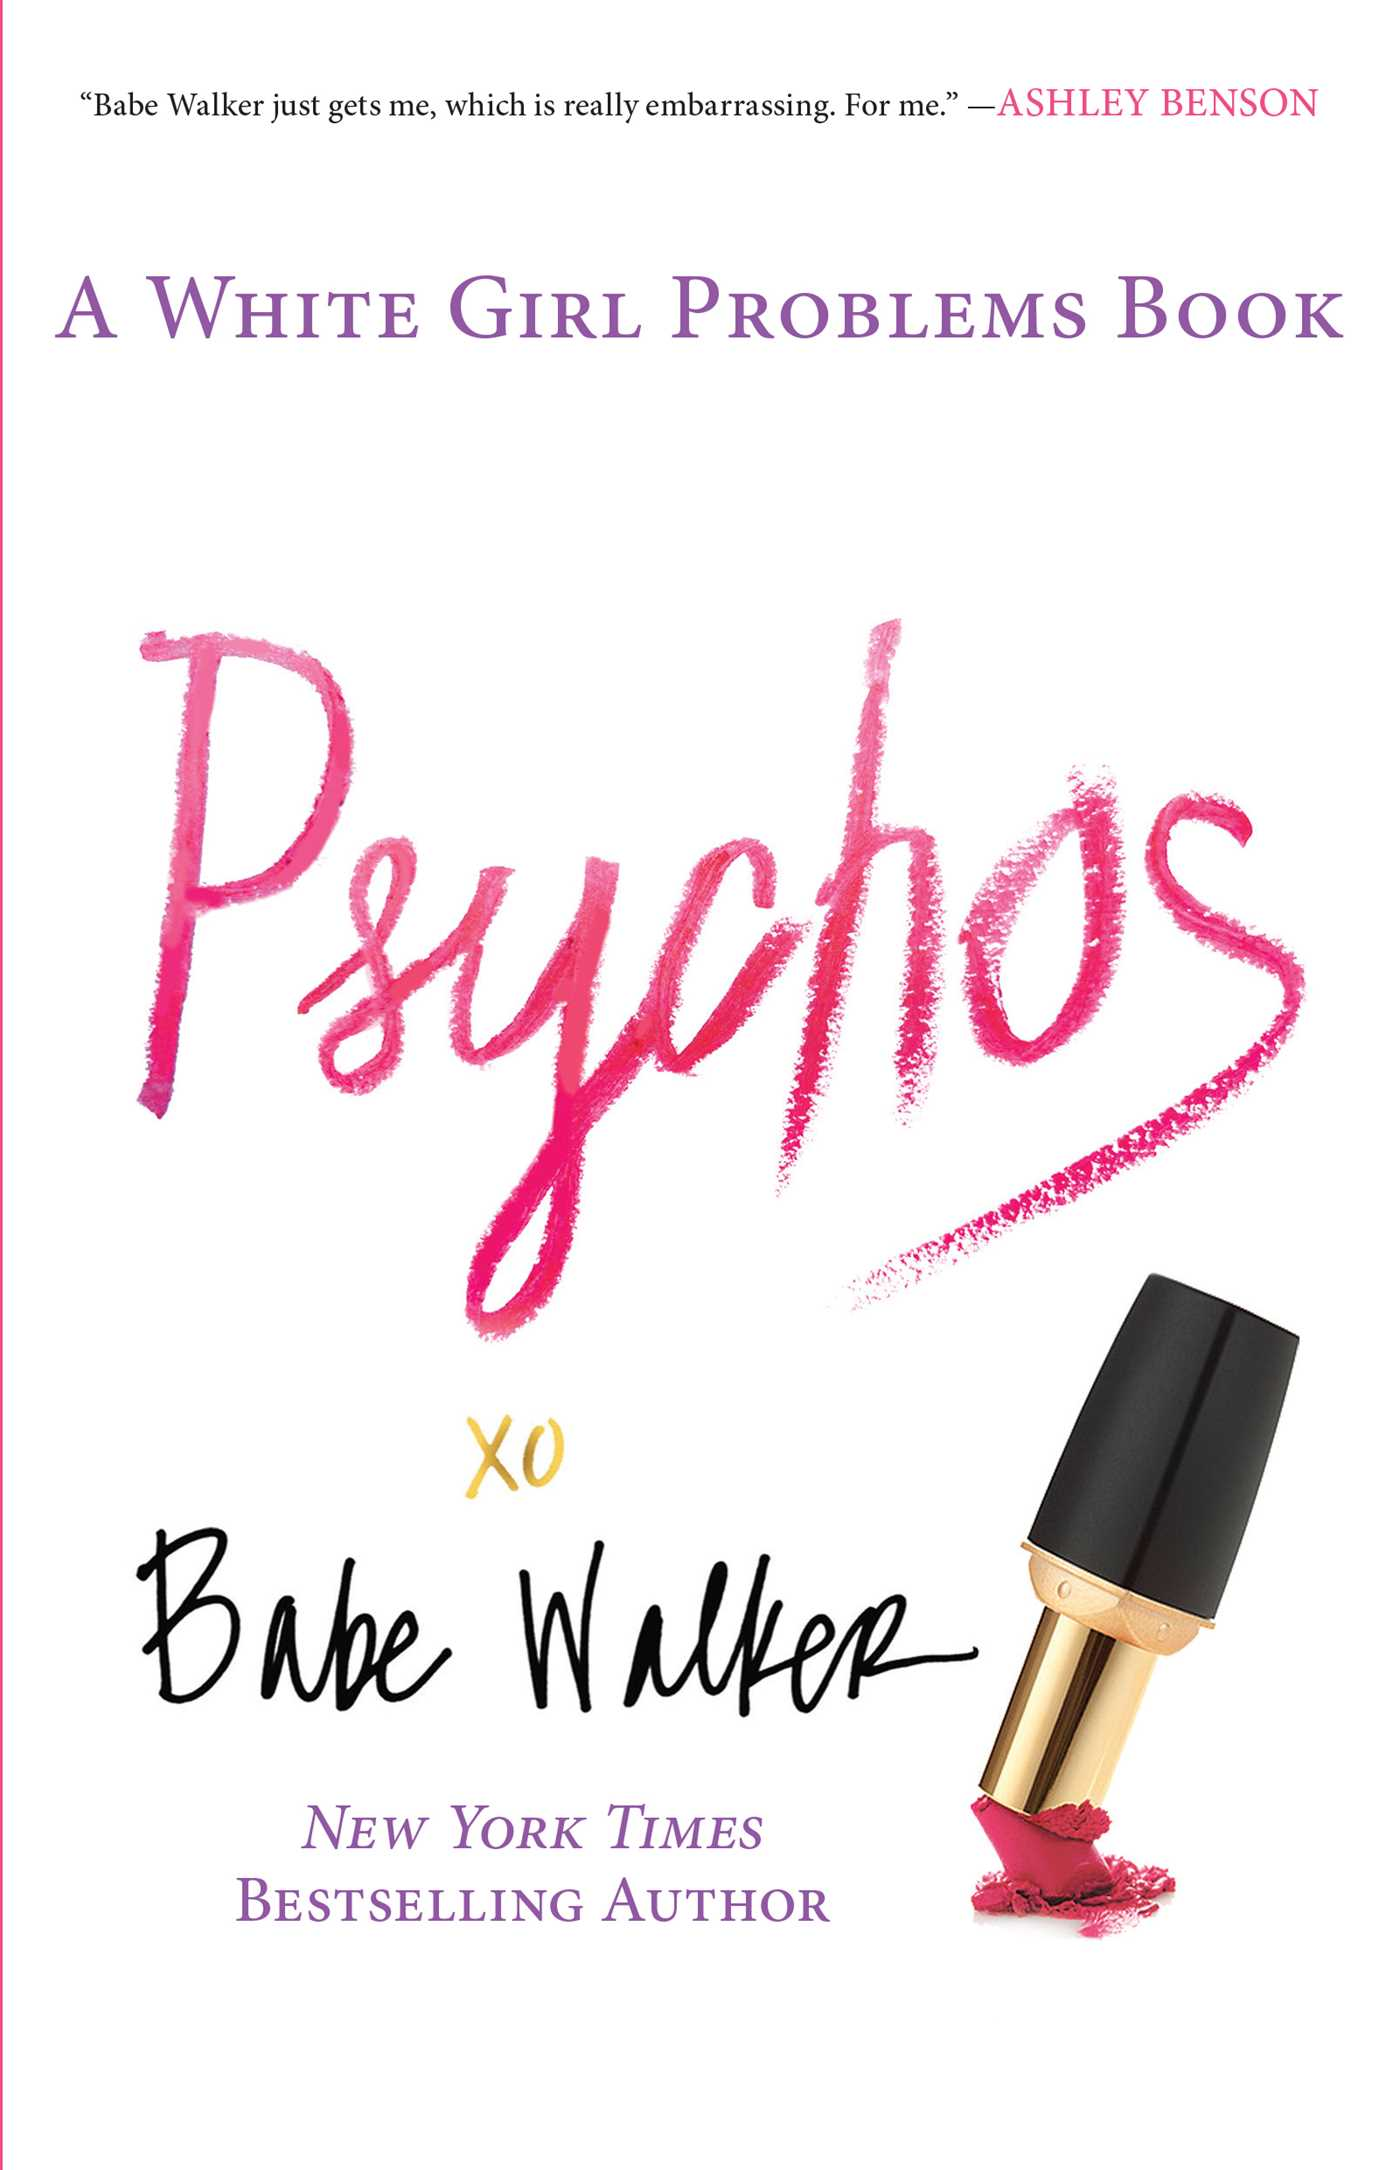 Psychos a white girl problems book 9781476734163 hr